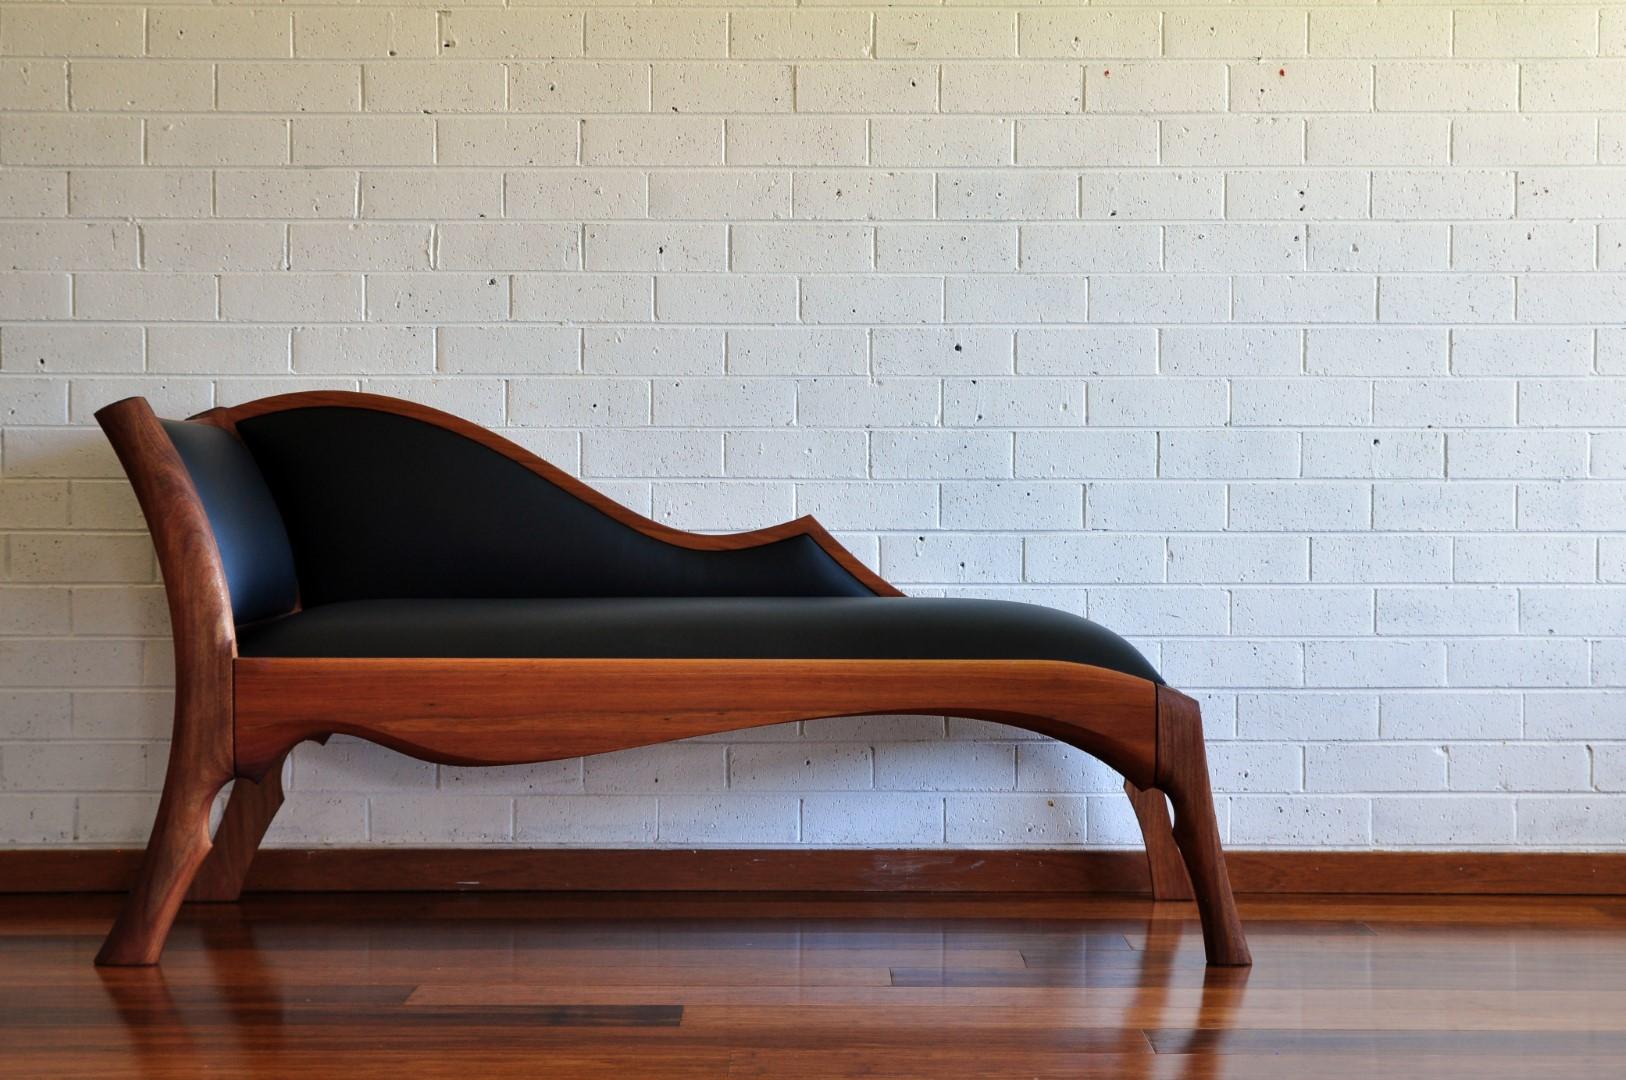 bespoke custom furniture chaise longue chair leather paul chilton